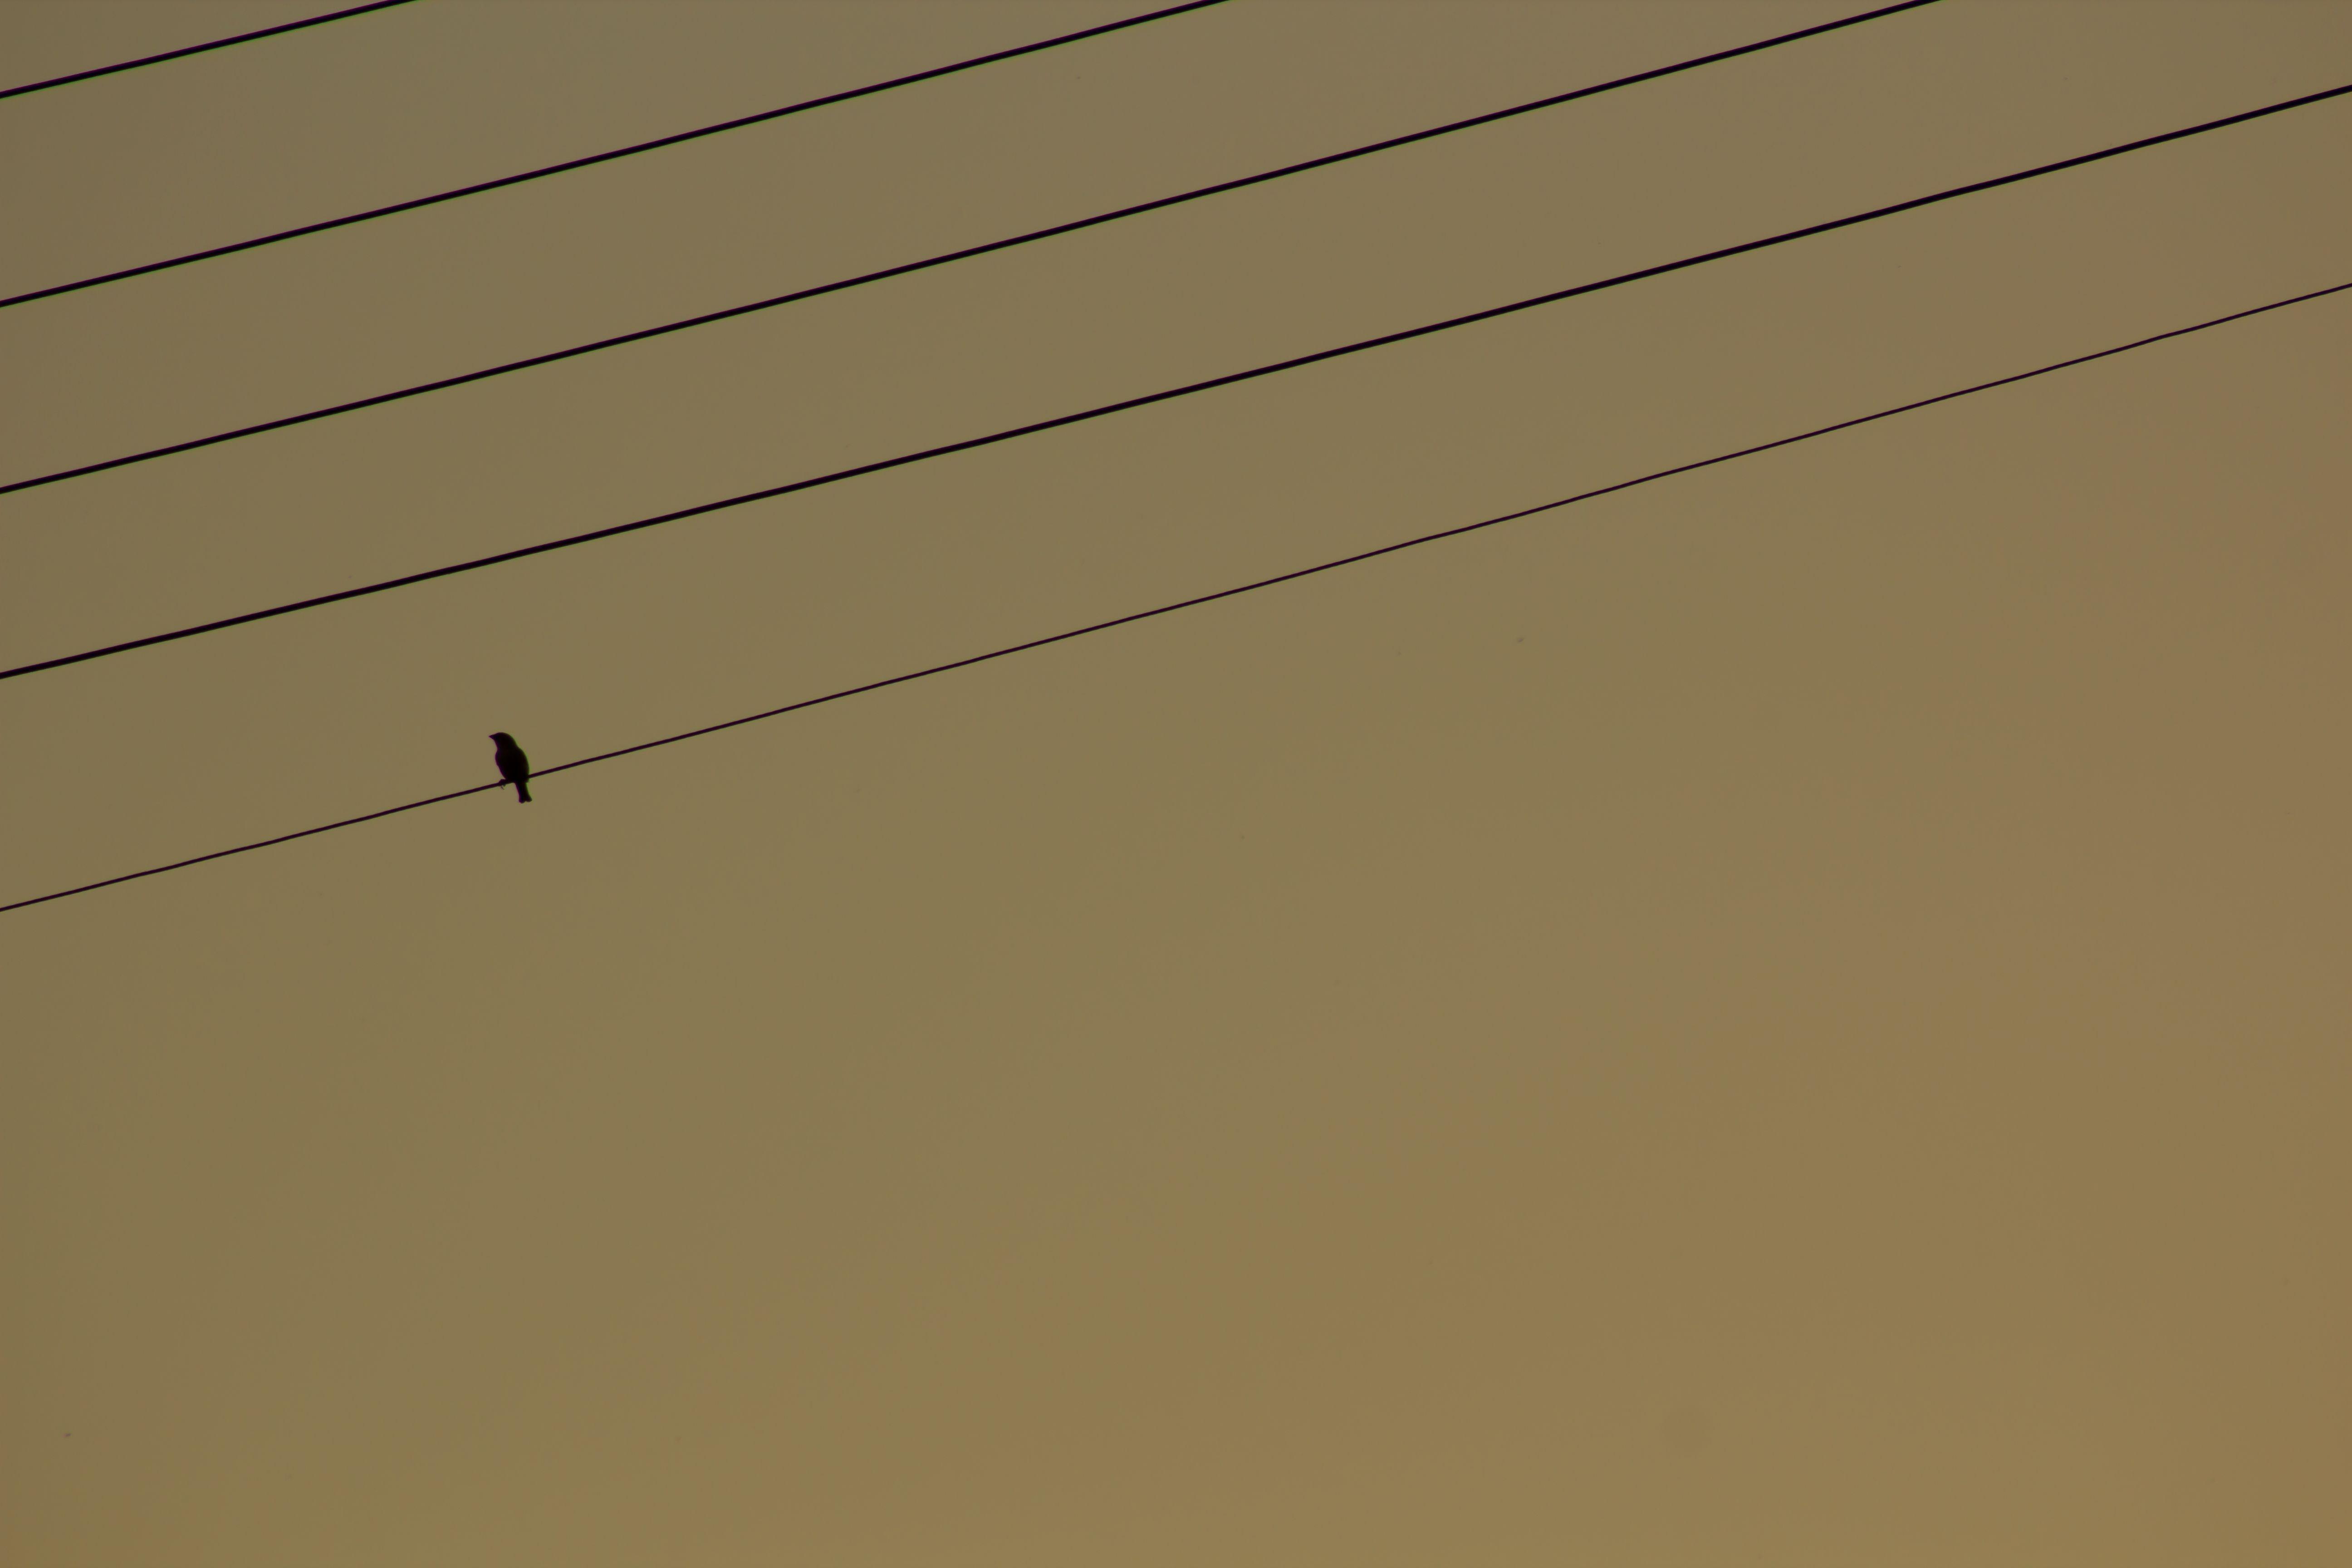 cowbird-west-bekaa-lebanon-traveler